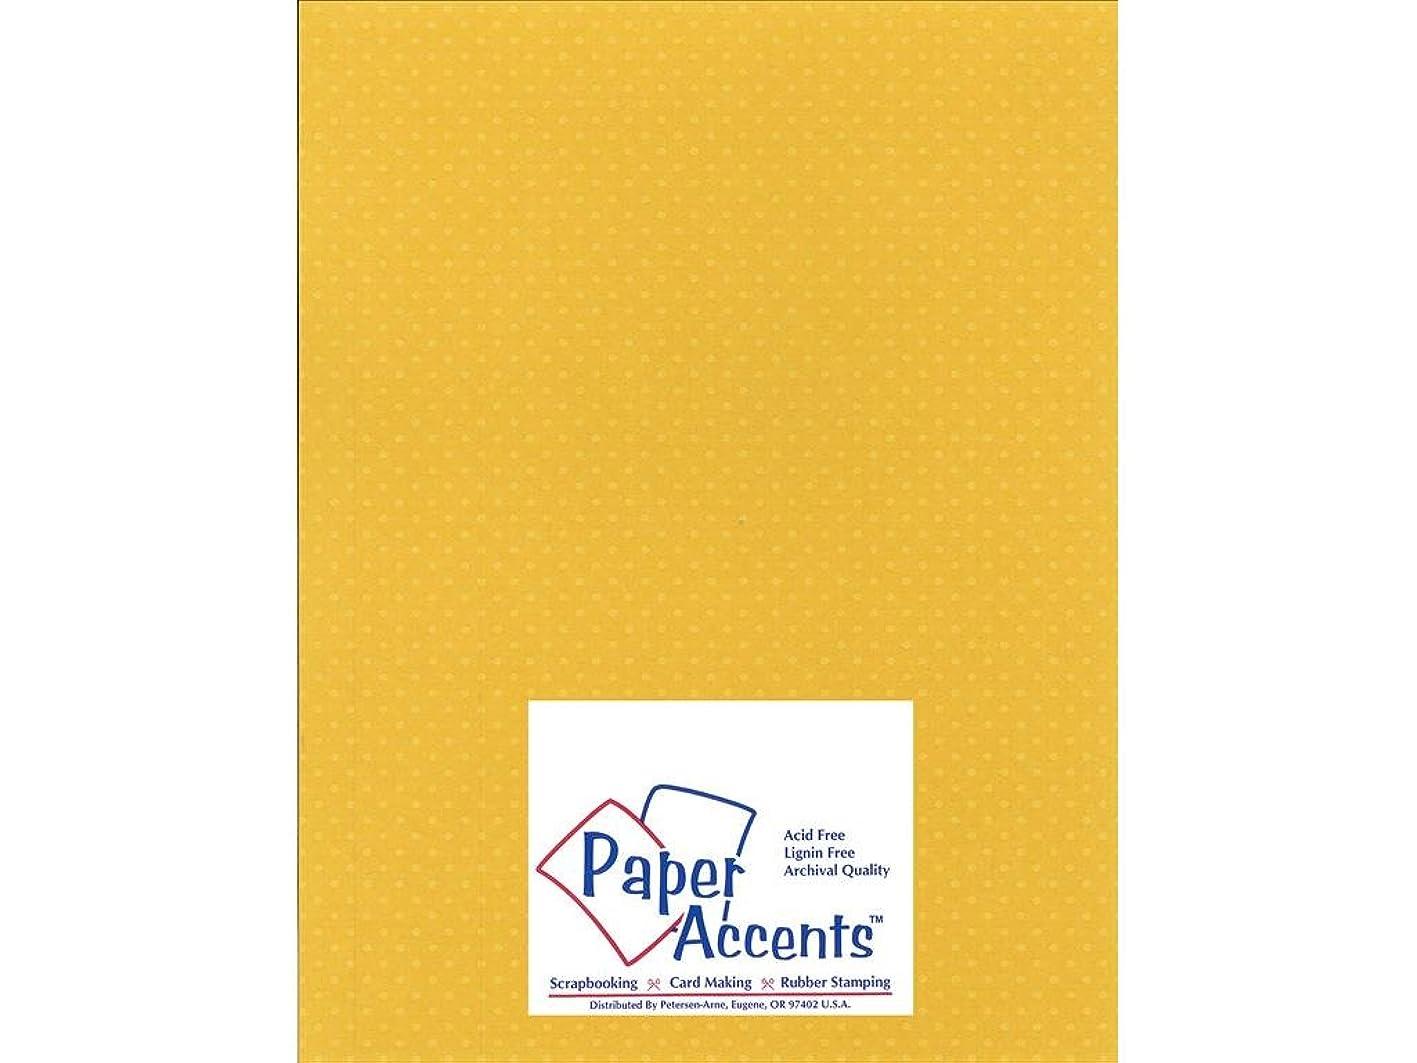 Accent Design Paper Accents Cdstk Mini Dots 8.5x11 80# Daffodil fwdeholtfum874